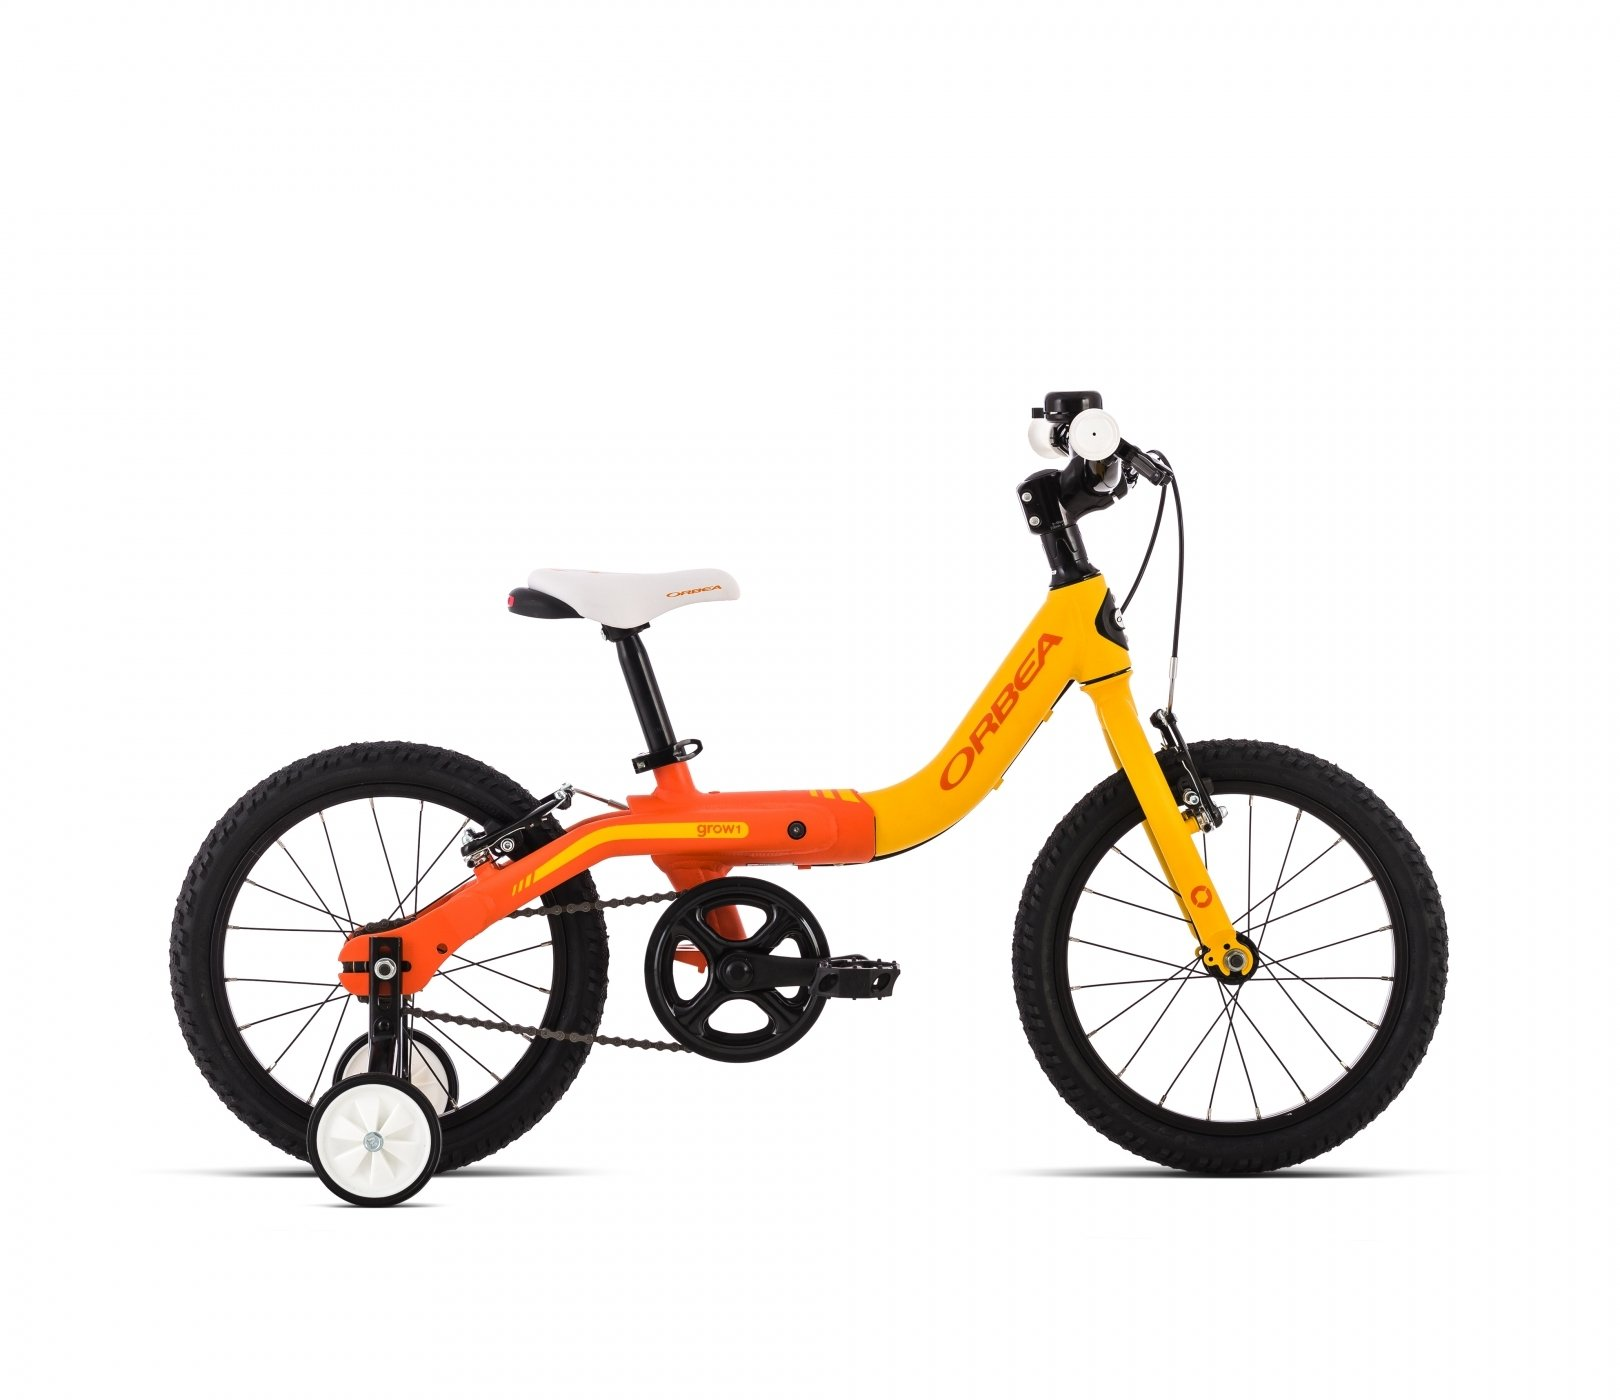 Bicicleta Infantil Orbea Grow 1, naranja: Amazon.es: Deportes y ...